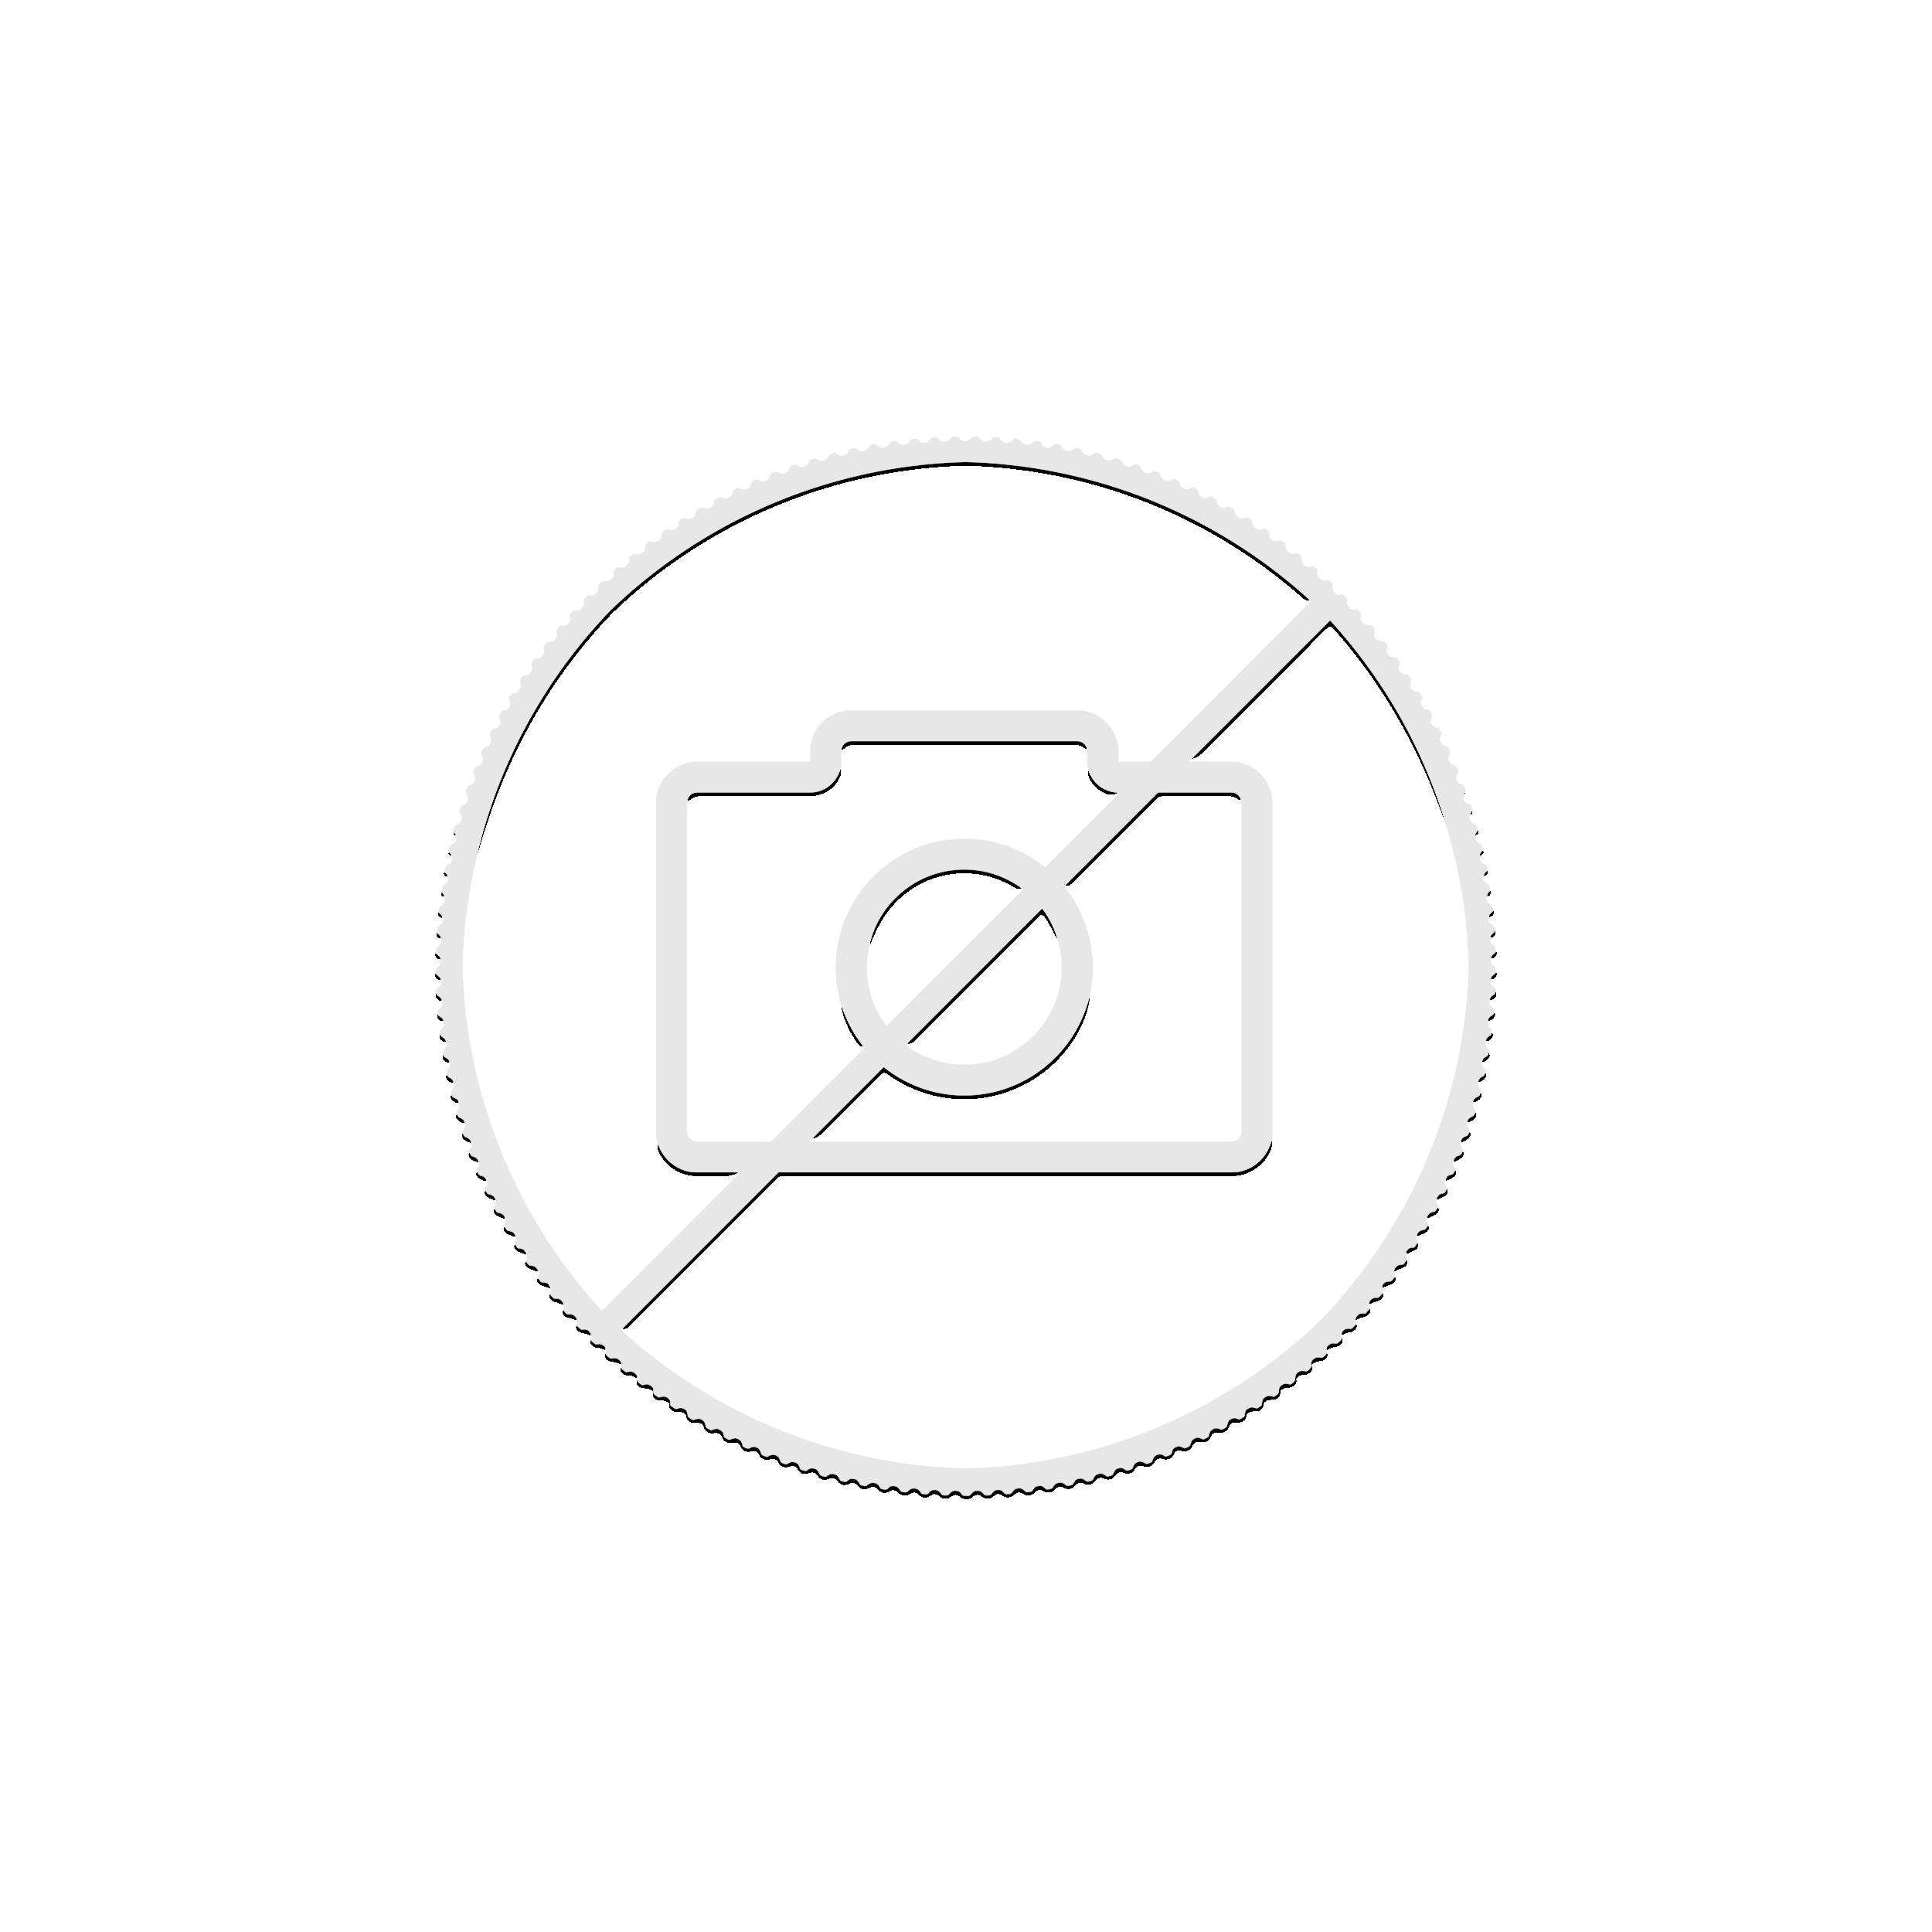 1 Kilo Kookaburra silver coin 2010